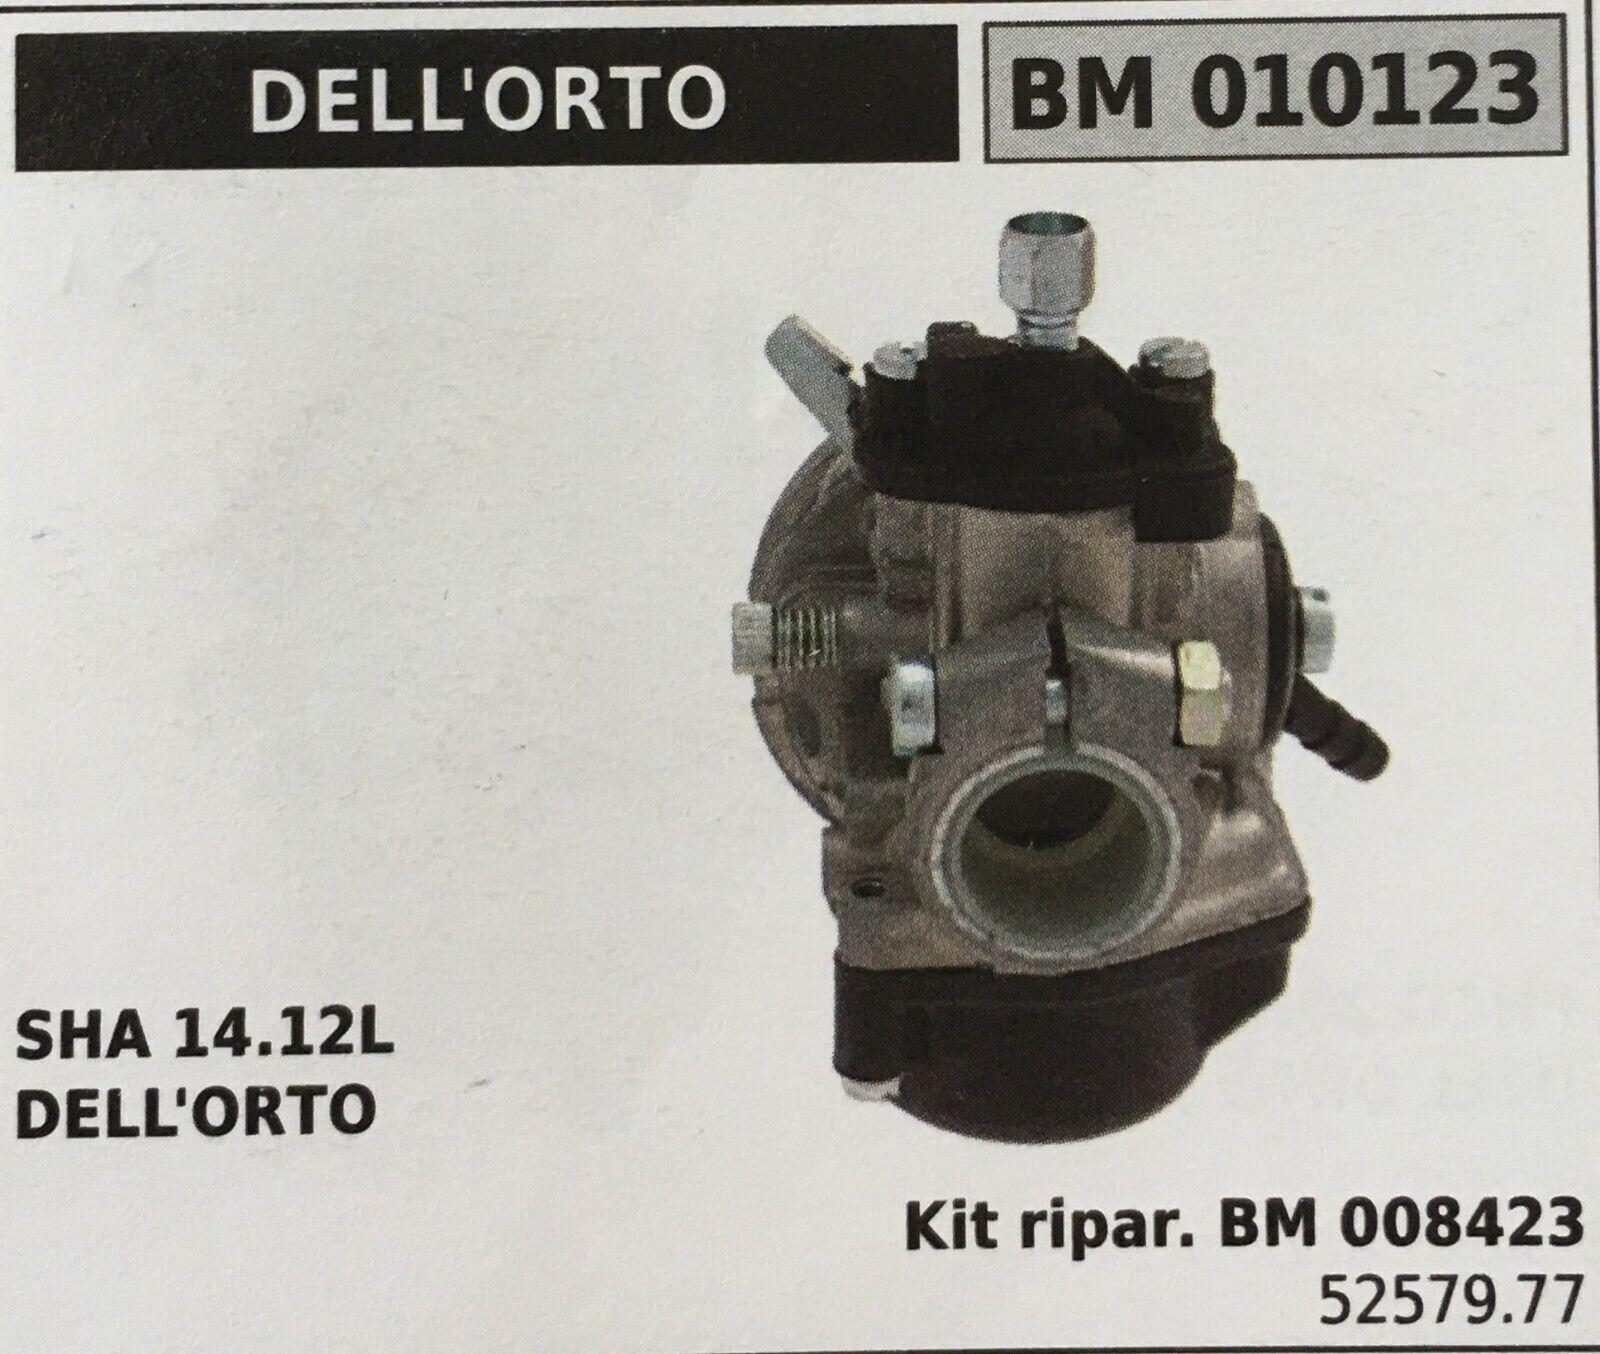 Cocheburador a Tanque Brumar Dell'Orto BM010123